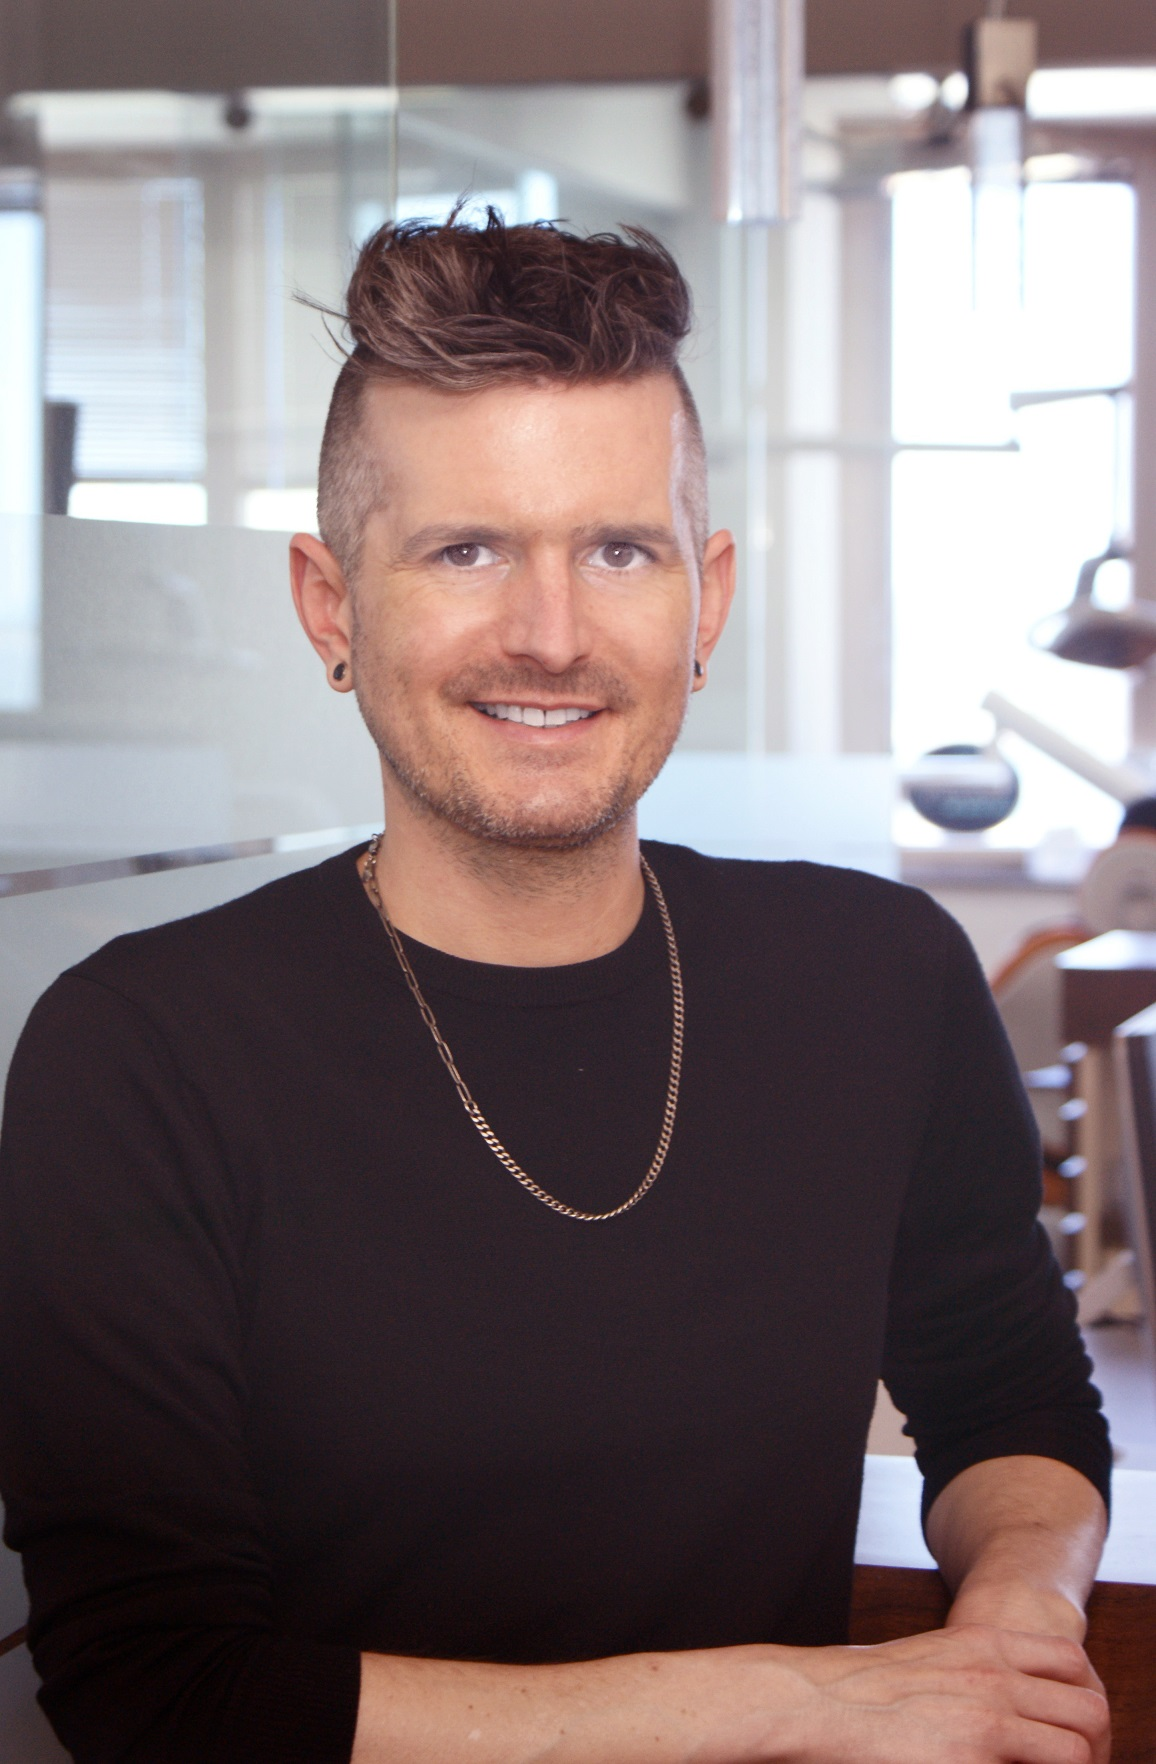 JOSH KELLEY - Dental Assistant